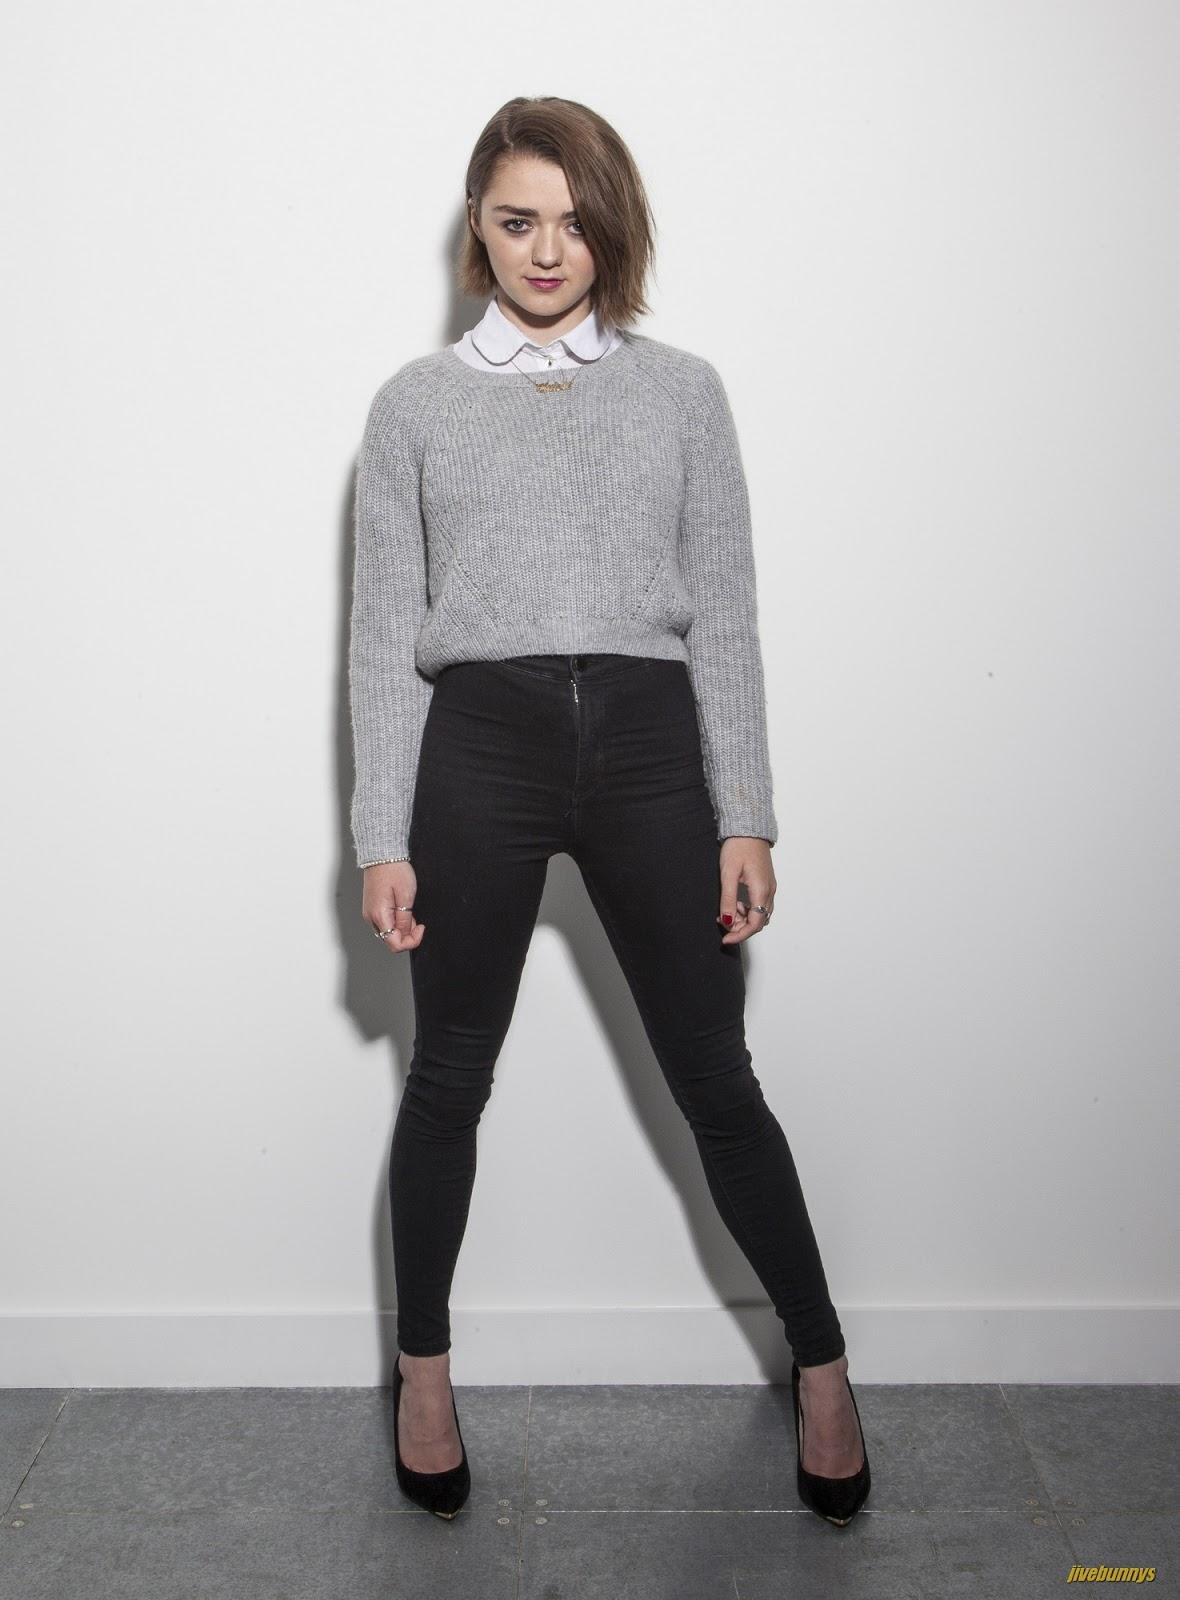 Galerry Maisie Williams HQ Photo Gallery 3